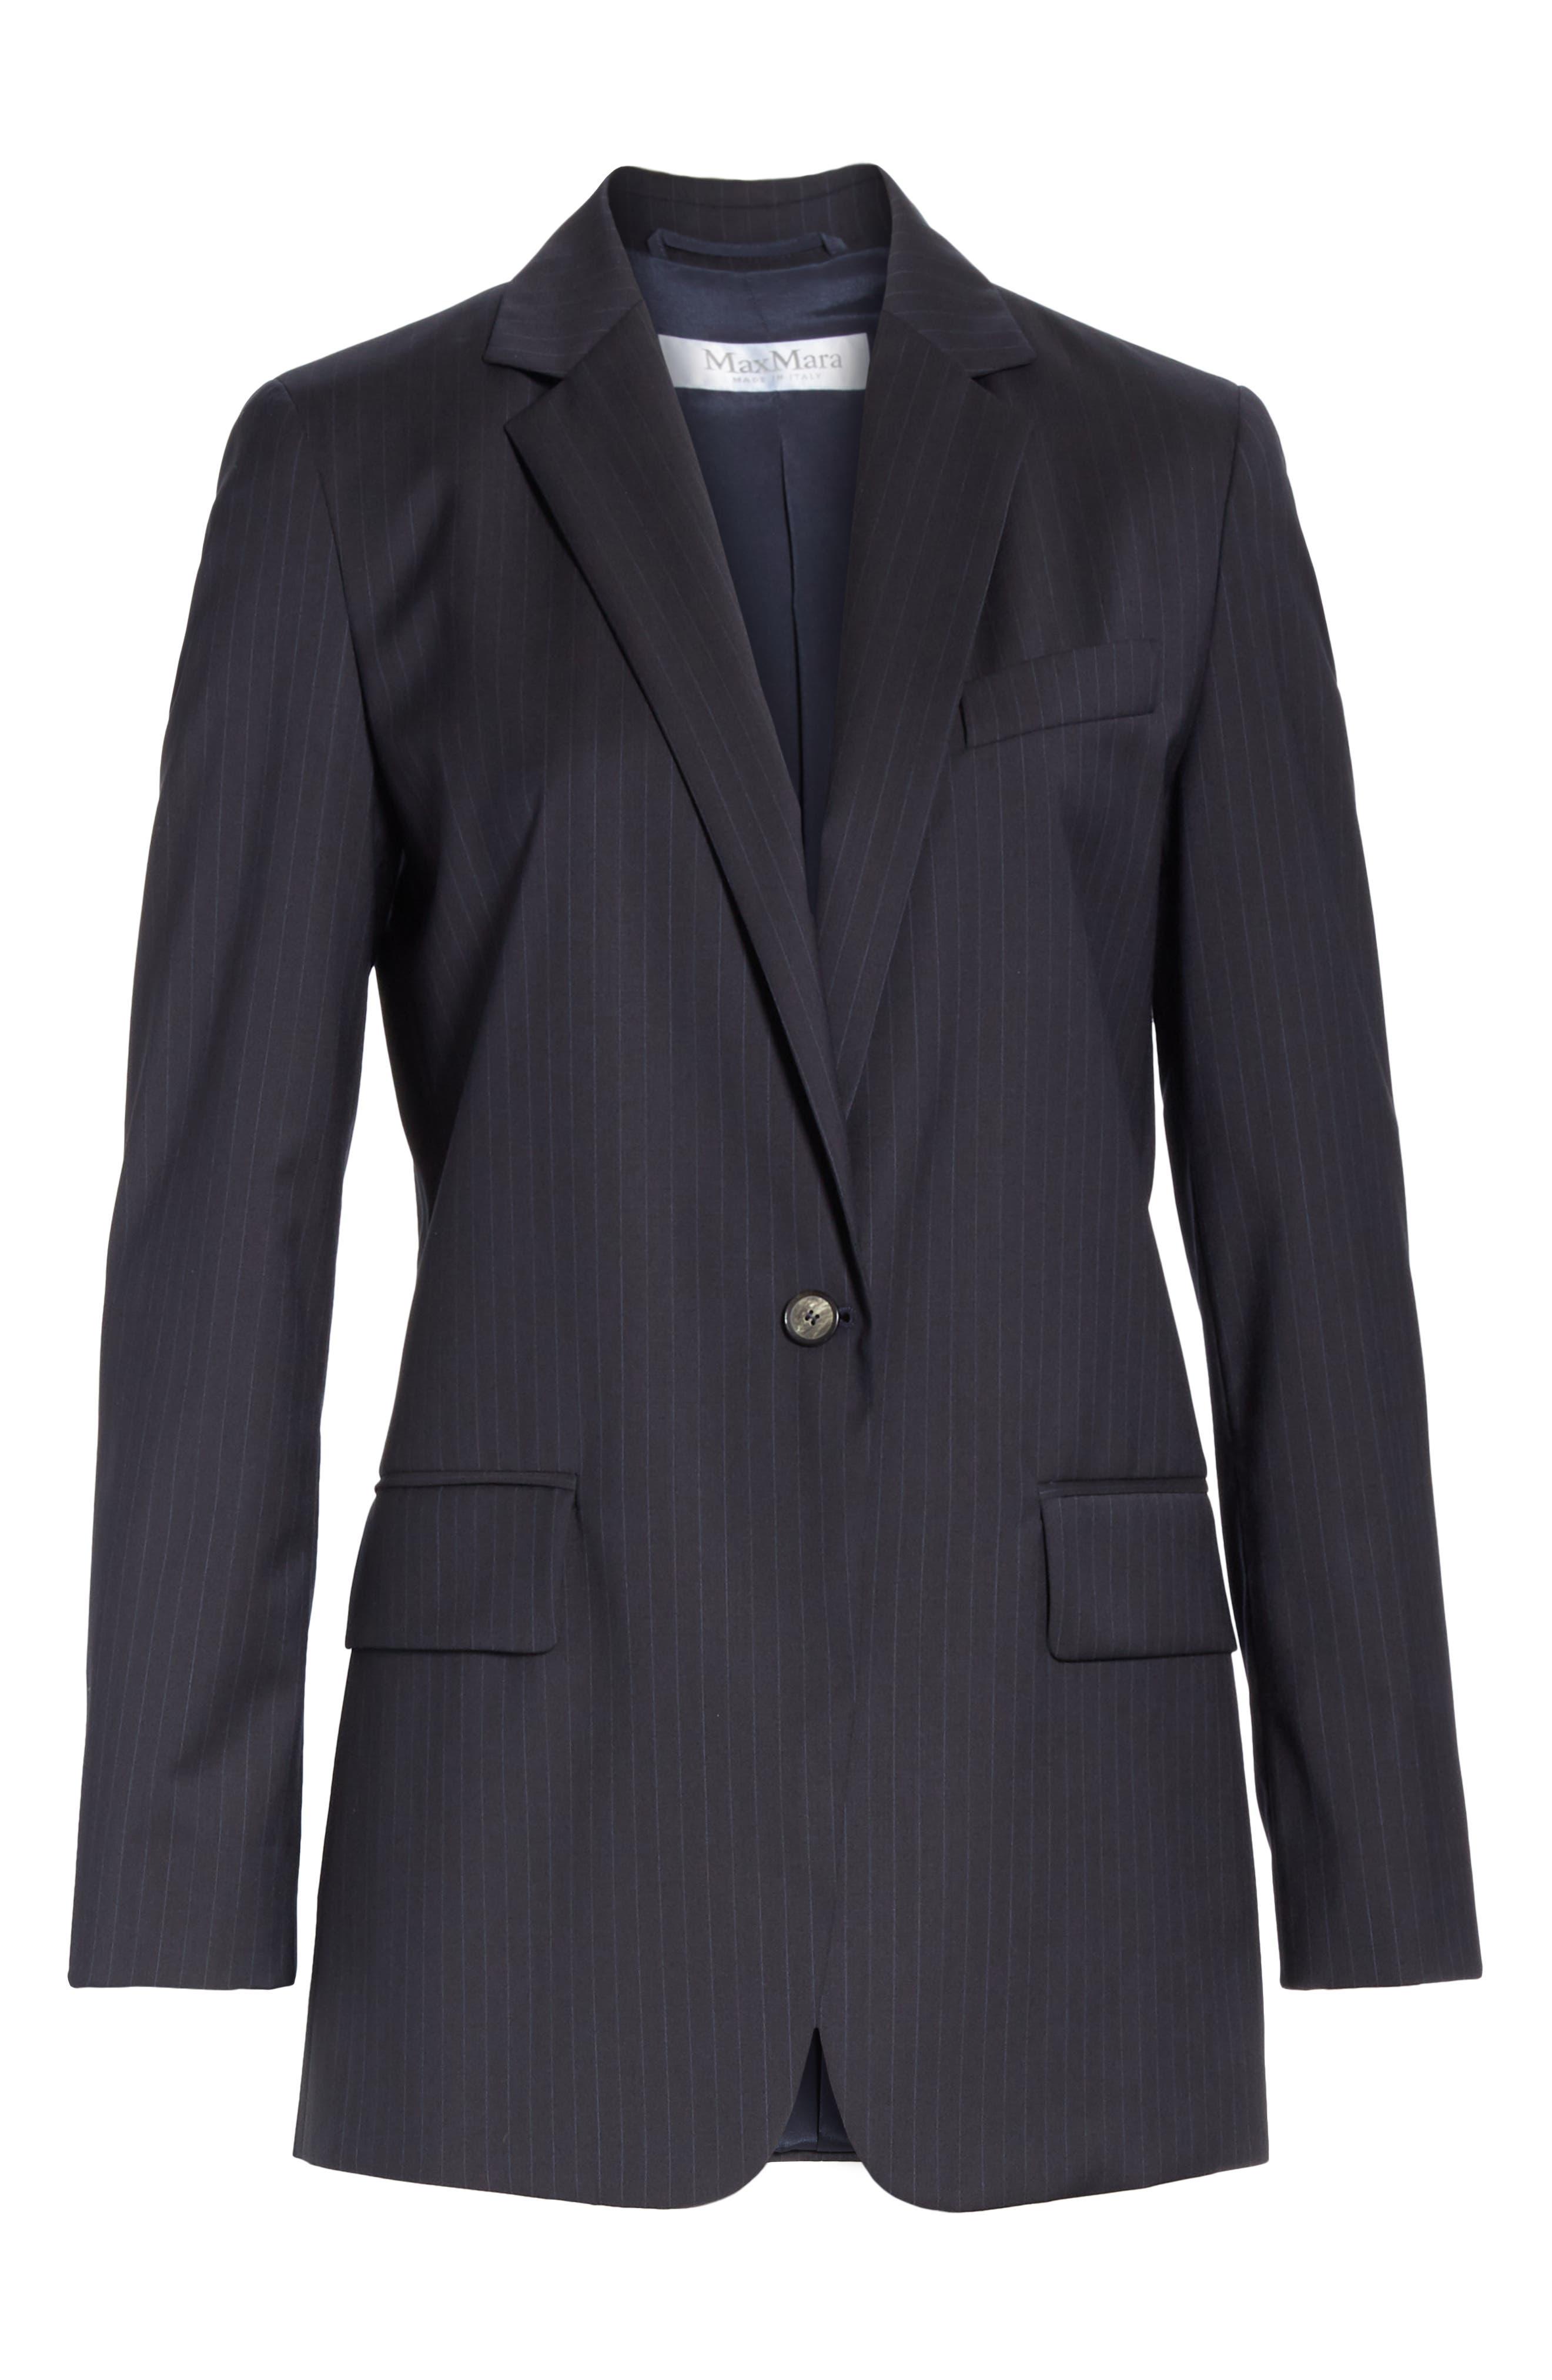 MAX MARA,                             Laser Single Button Wool Jacket,                             Alternate thumbnail 6, color,                             ULTRAMARINE